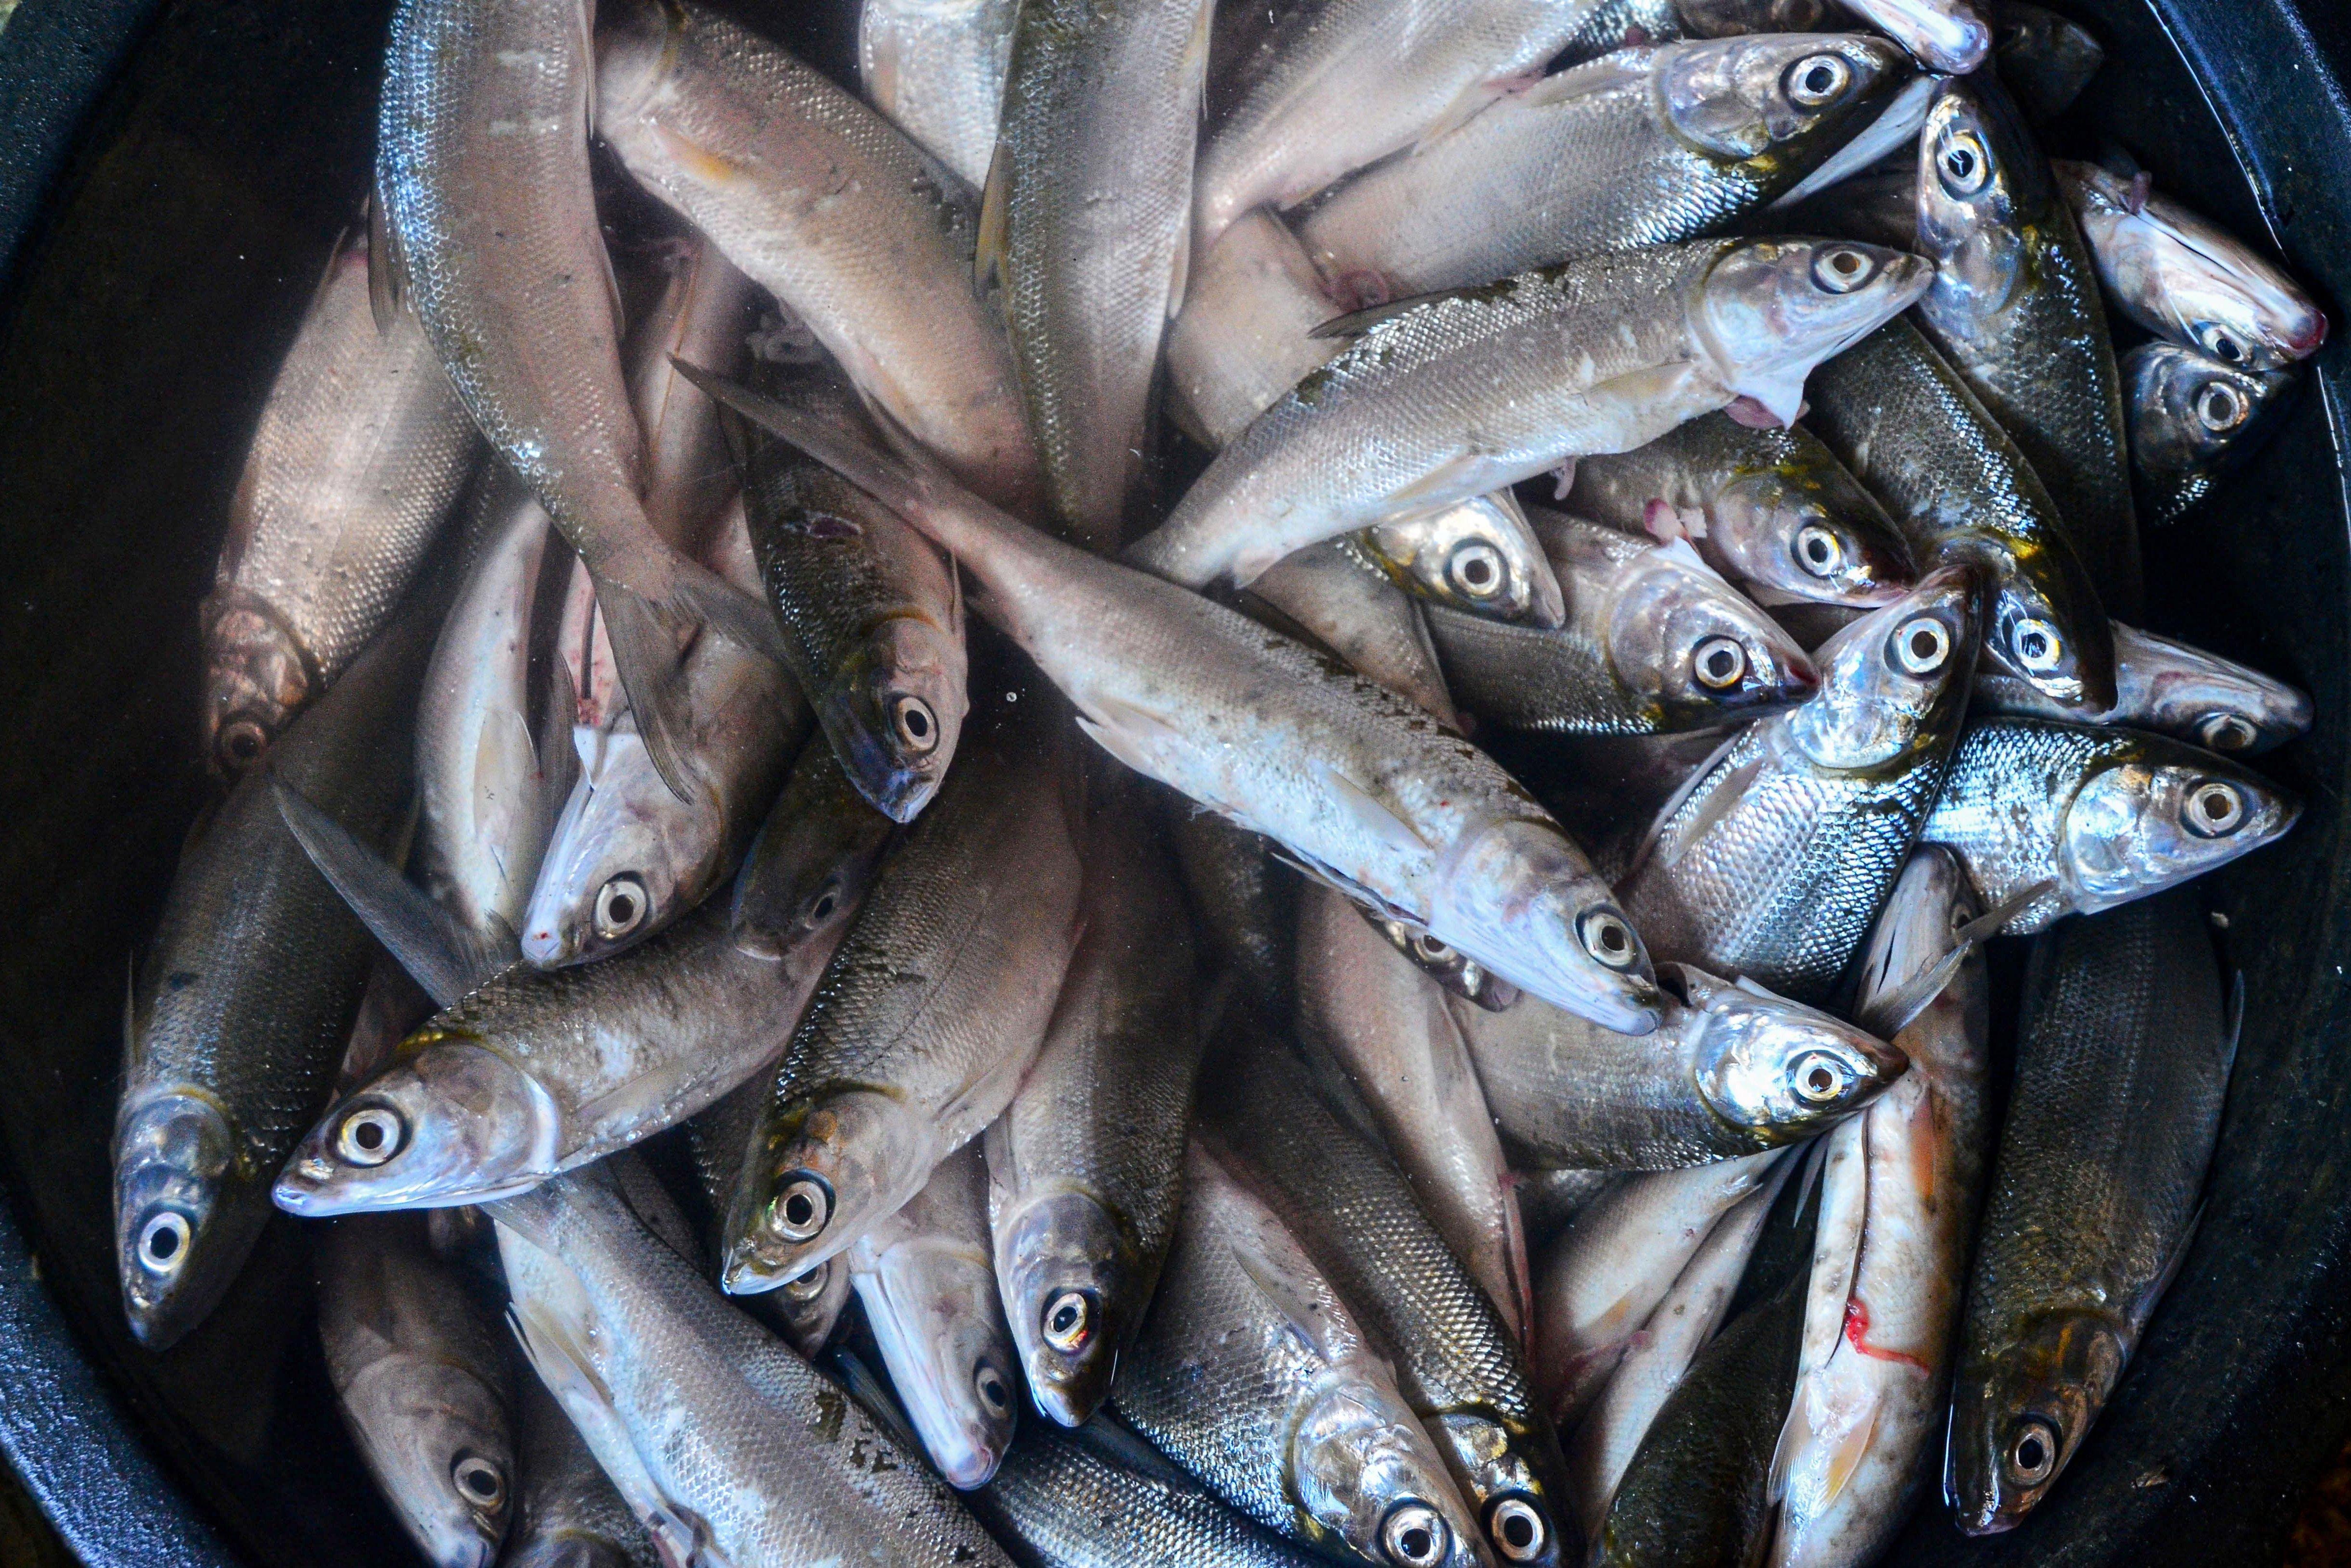 Ikan bandeng sebelum diolah di Desa Dukutalit, Juwana, Pati, Jawa Tengah.